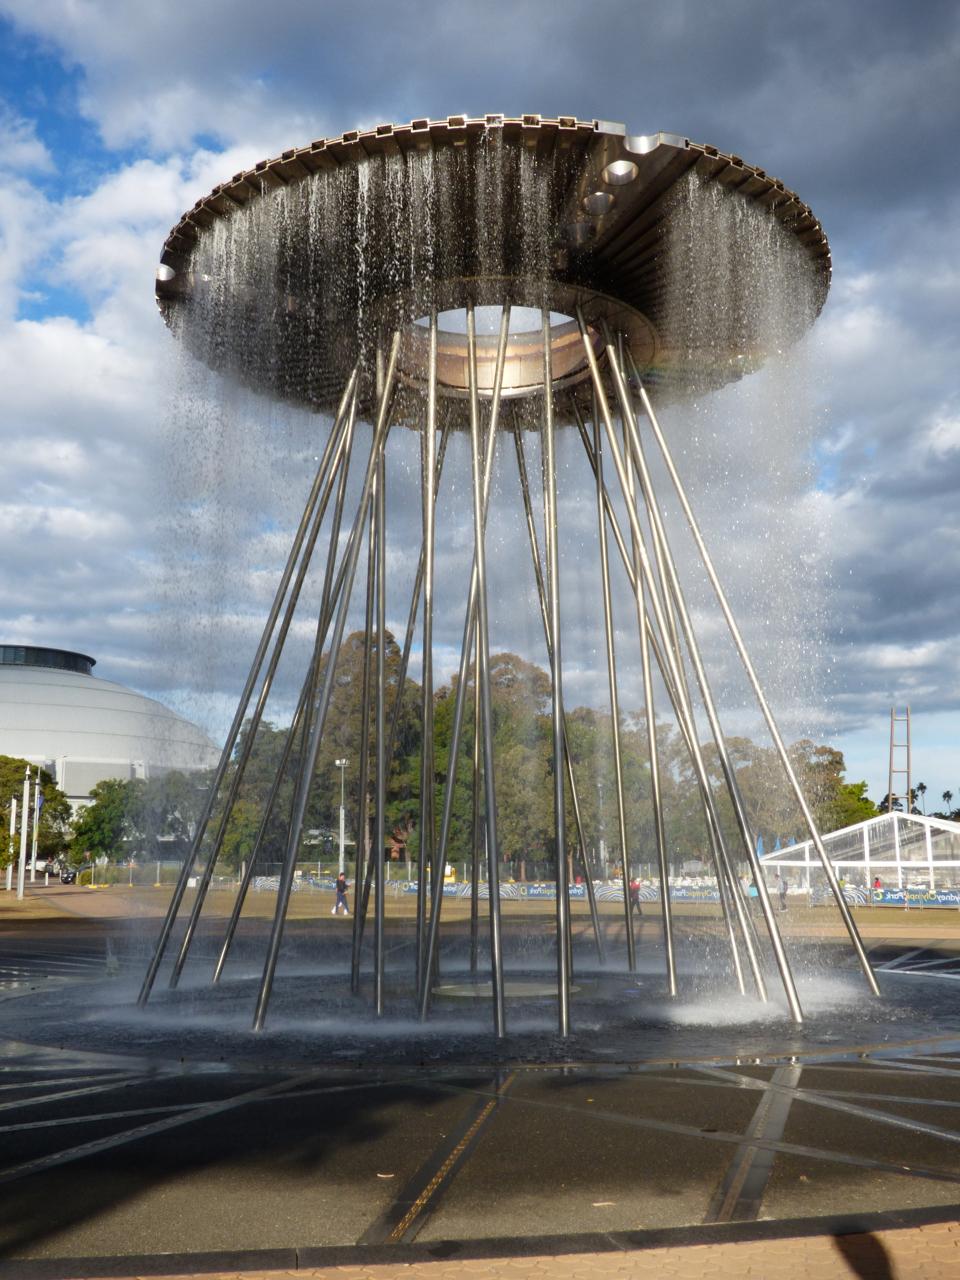 Sydney Olympic stadium